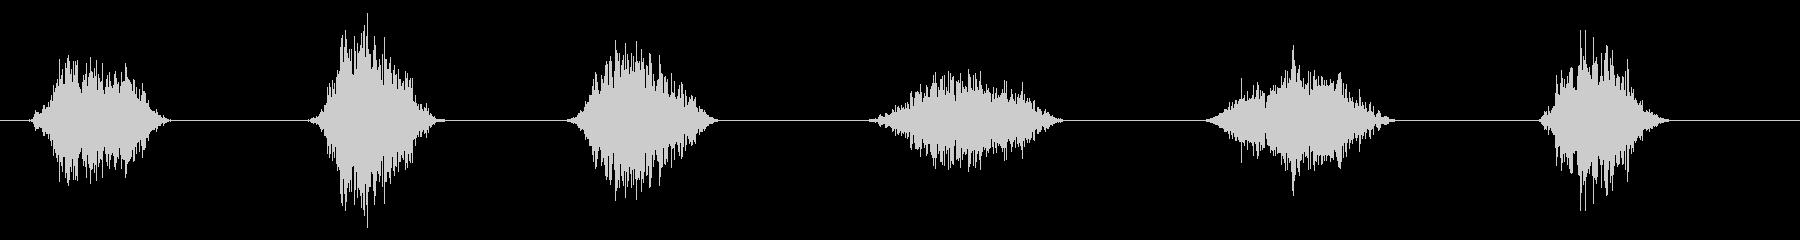 PC マウス ムーブ03-01(木)の未再生の波形